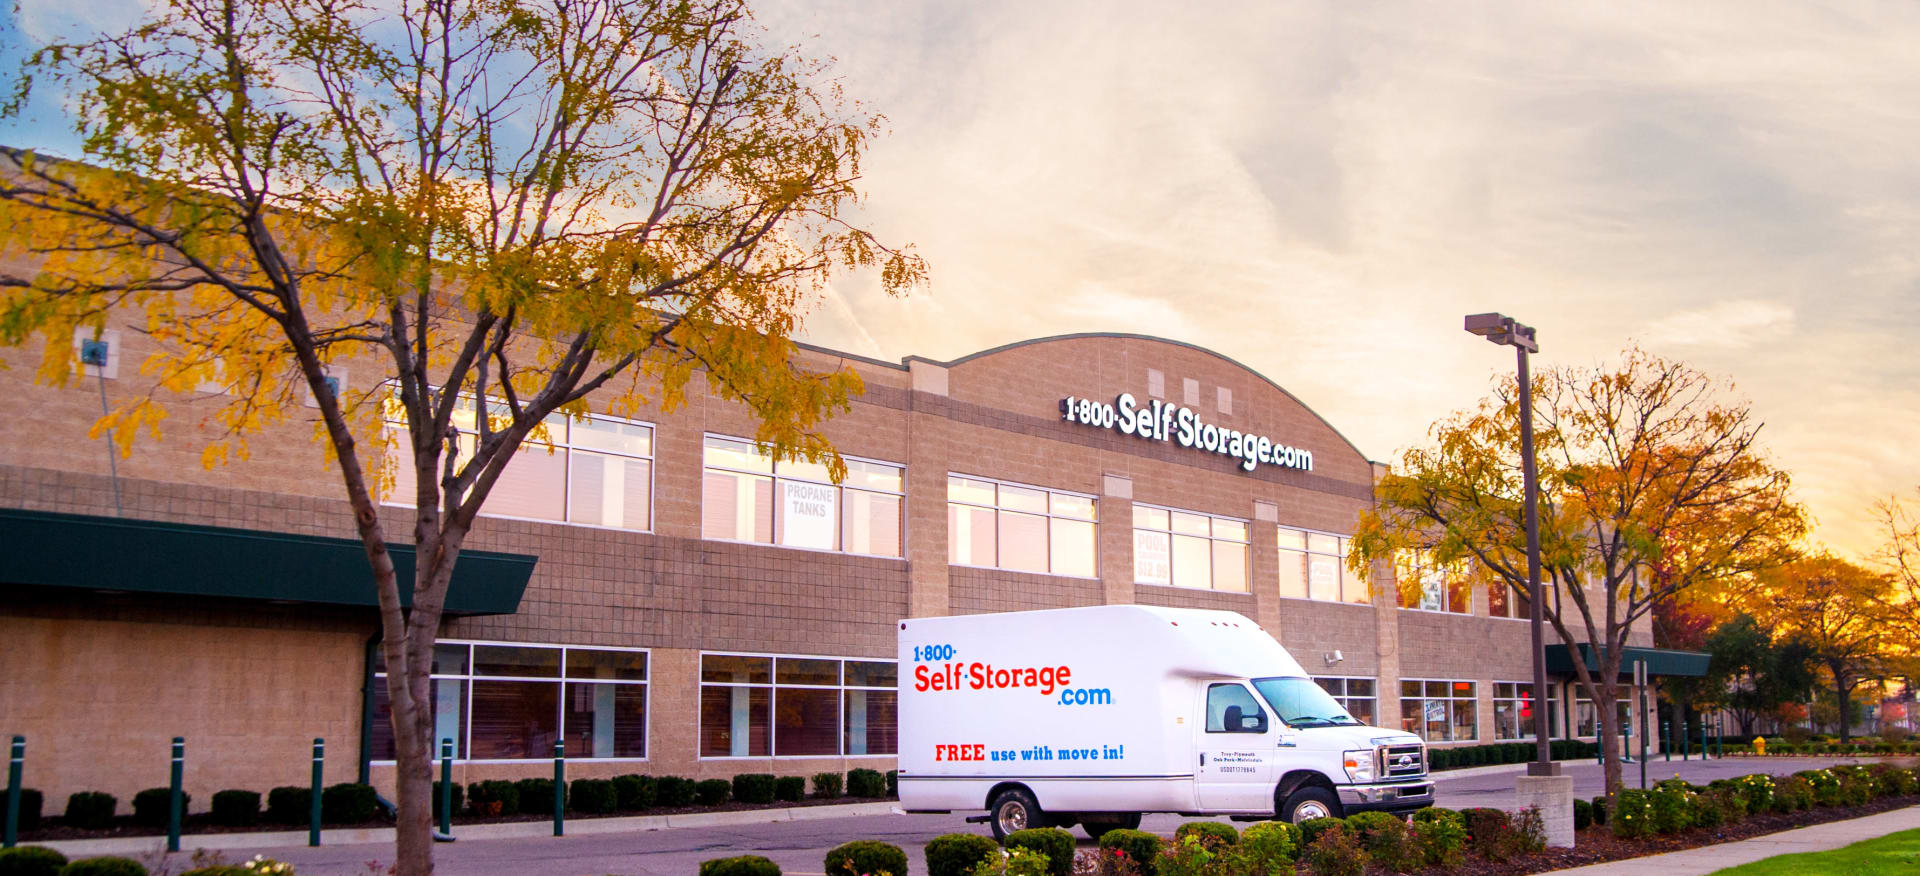 Self storage in Oak Park MI